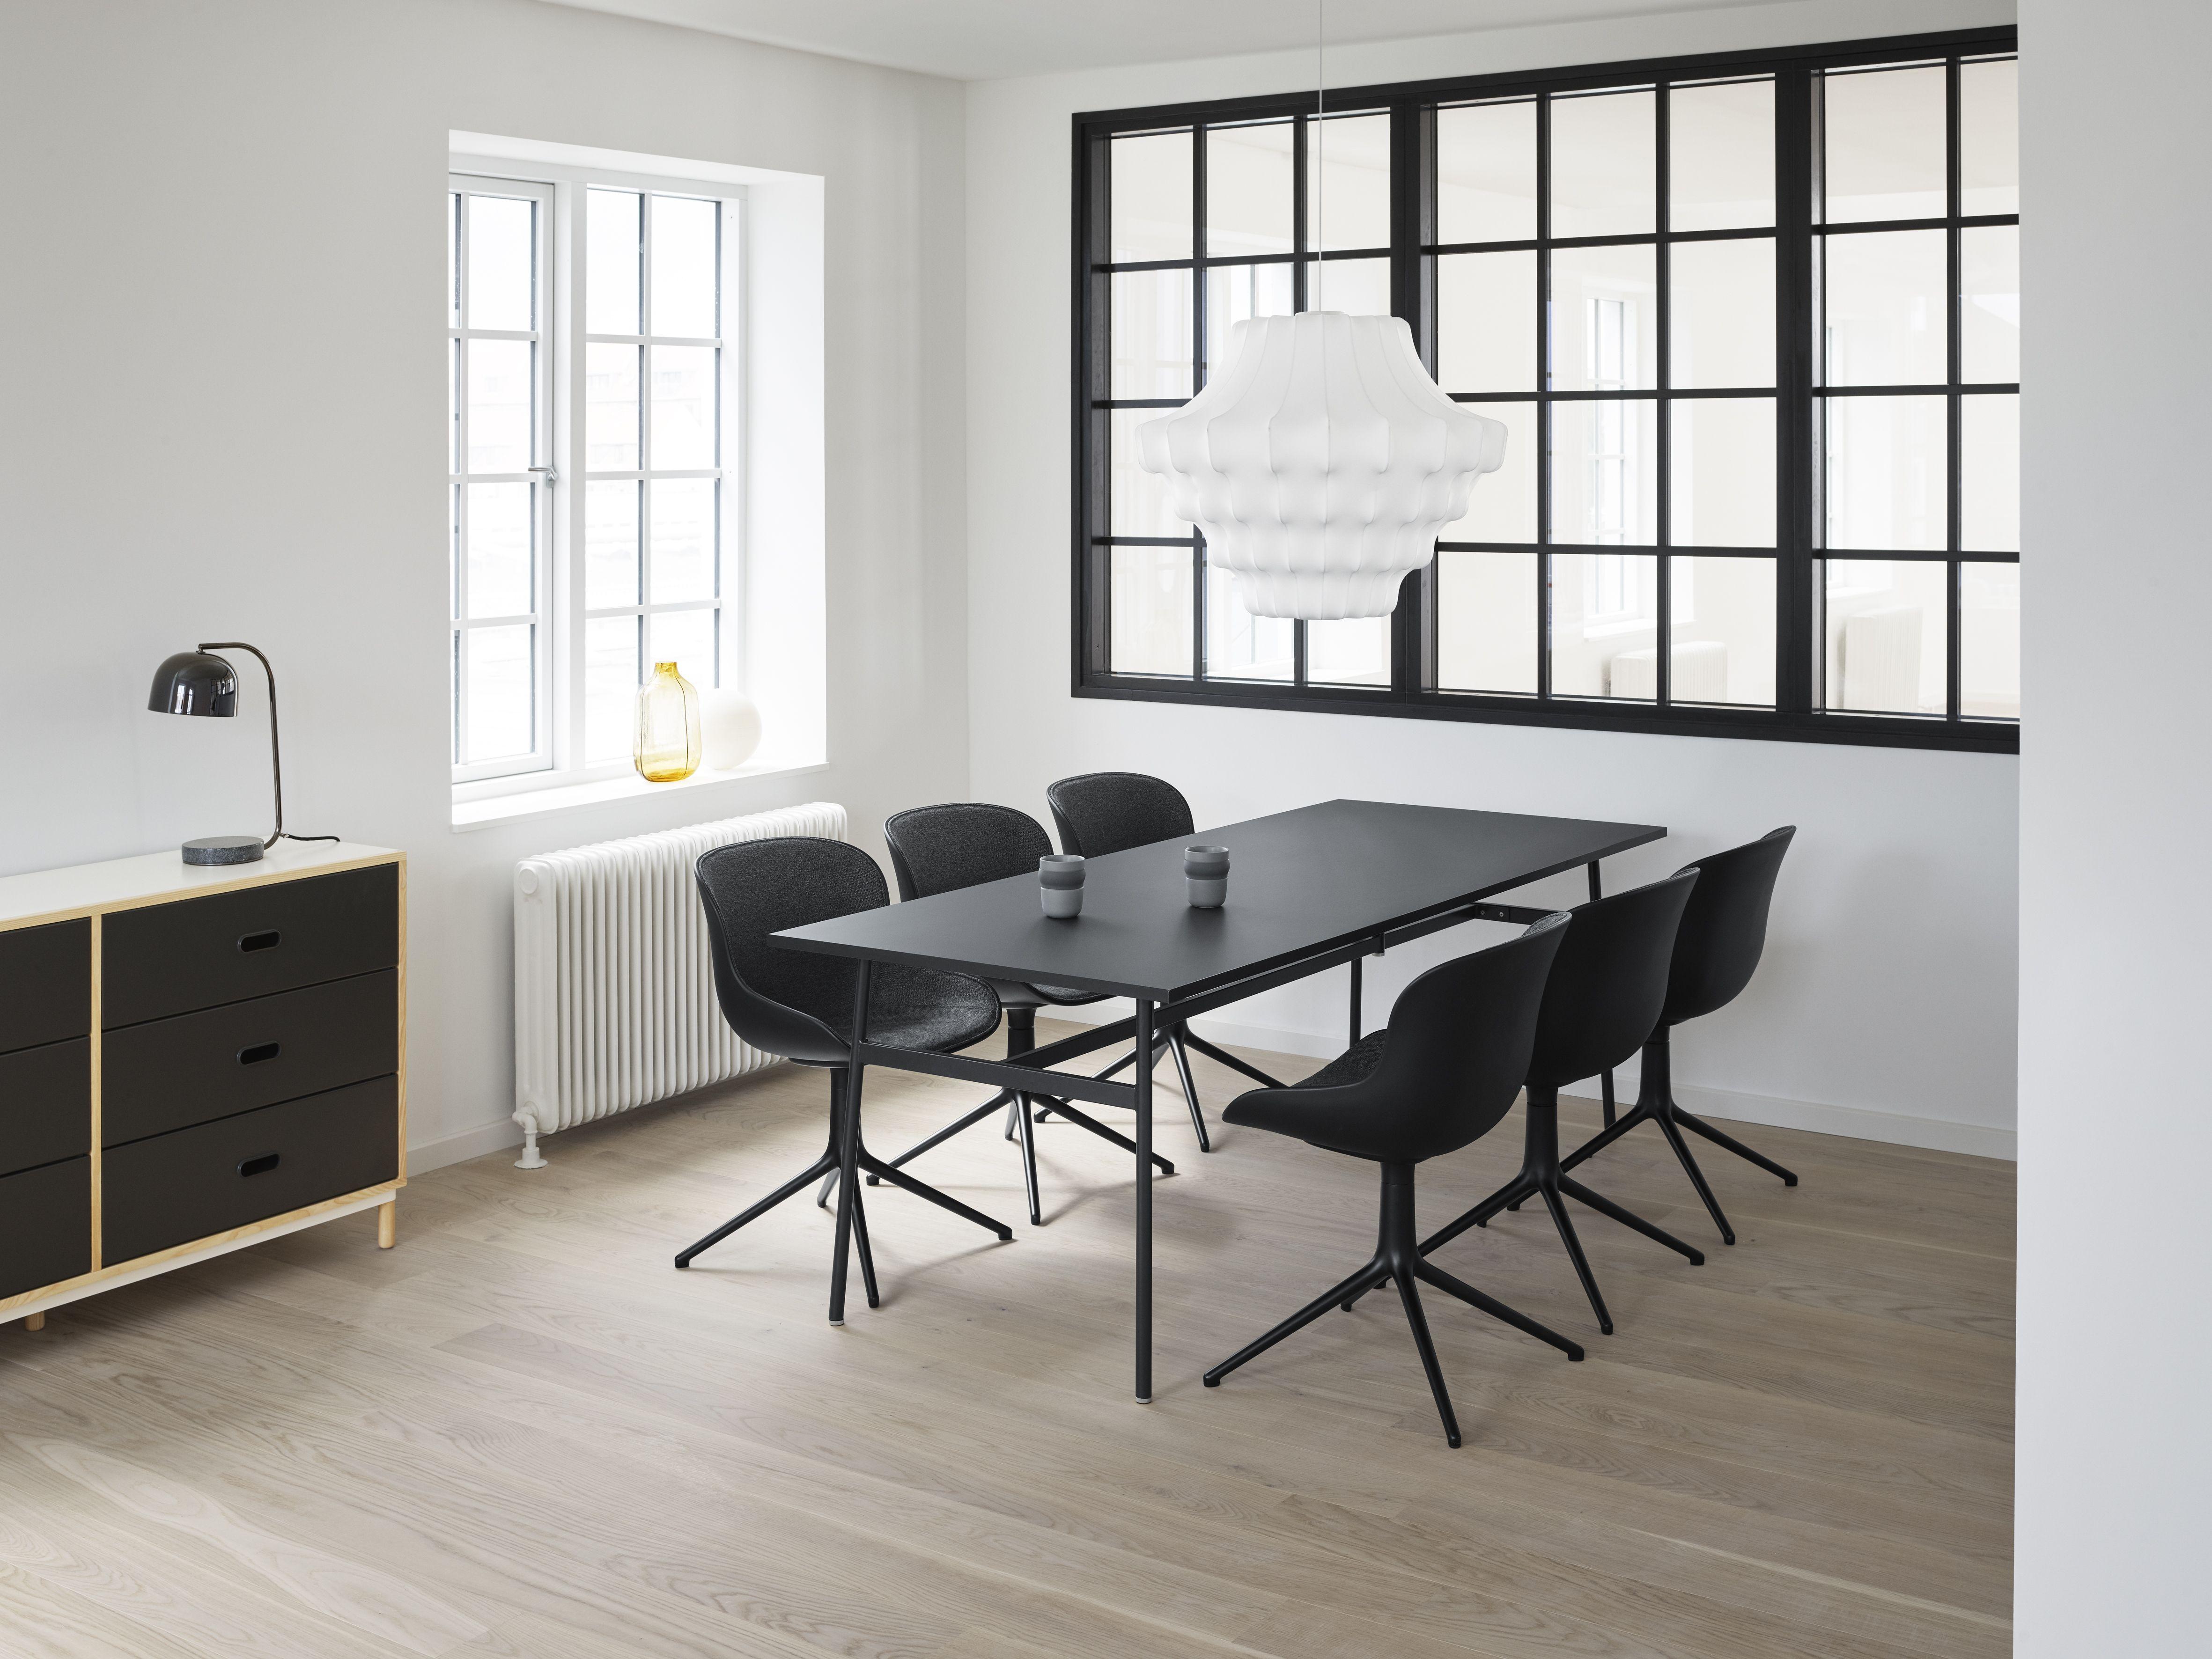 The Hyg Family Scandinavian Furniture Design Furniture Design Scandinavian Design